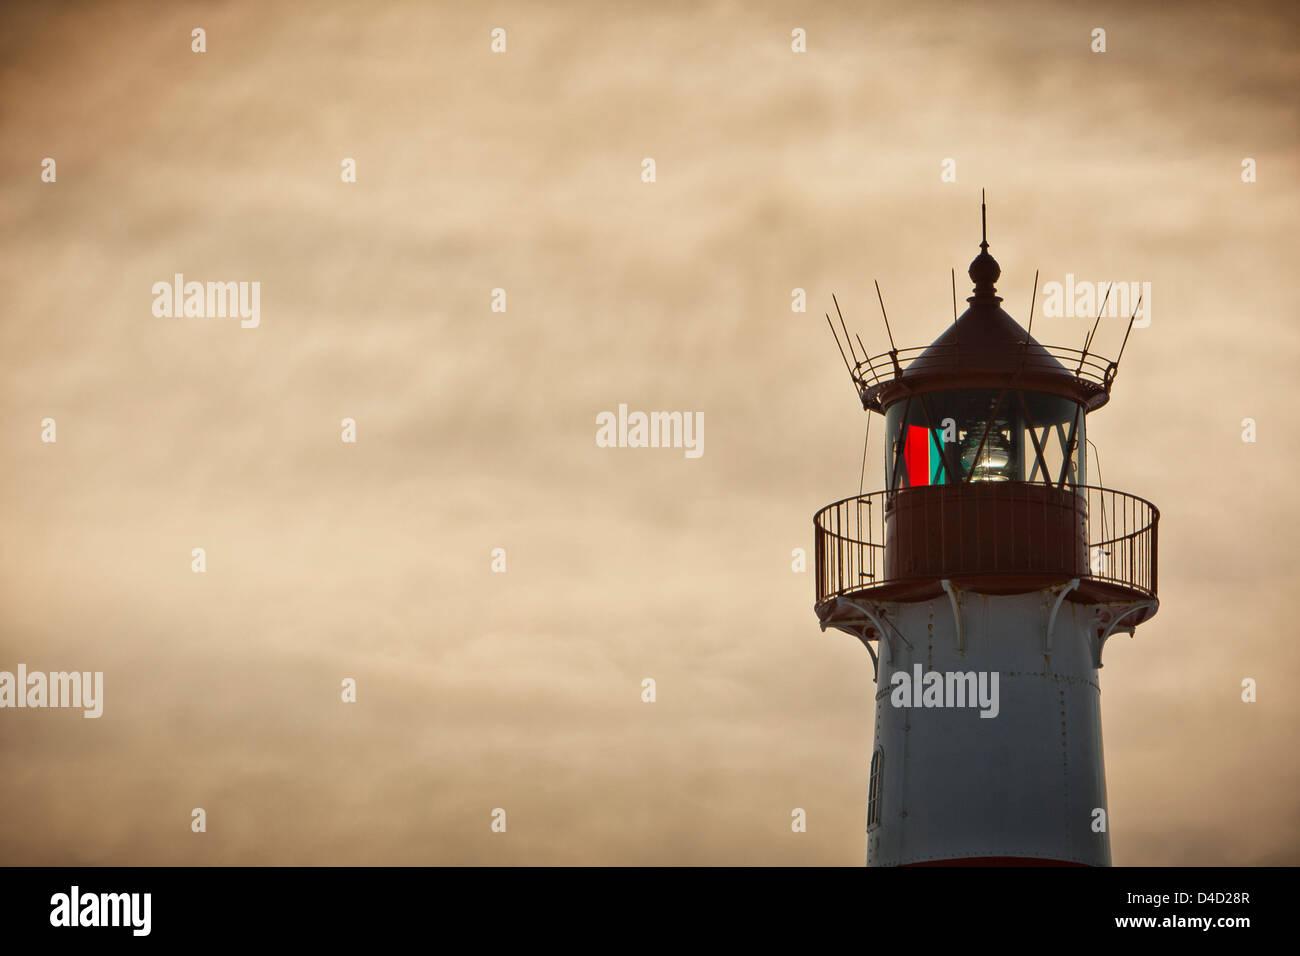 Lighthouse List-Ost on the Ellenbogen, Sylt, Germany, close-up - Stock Image